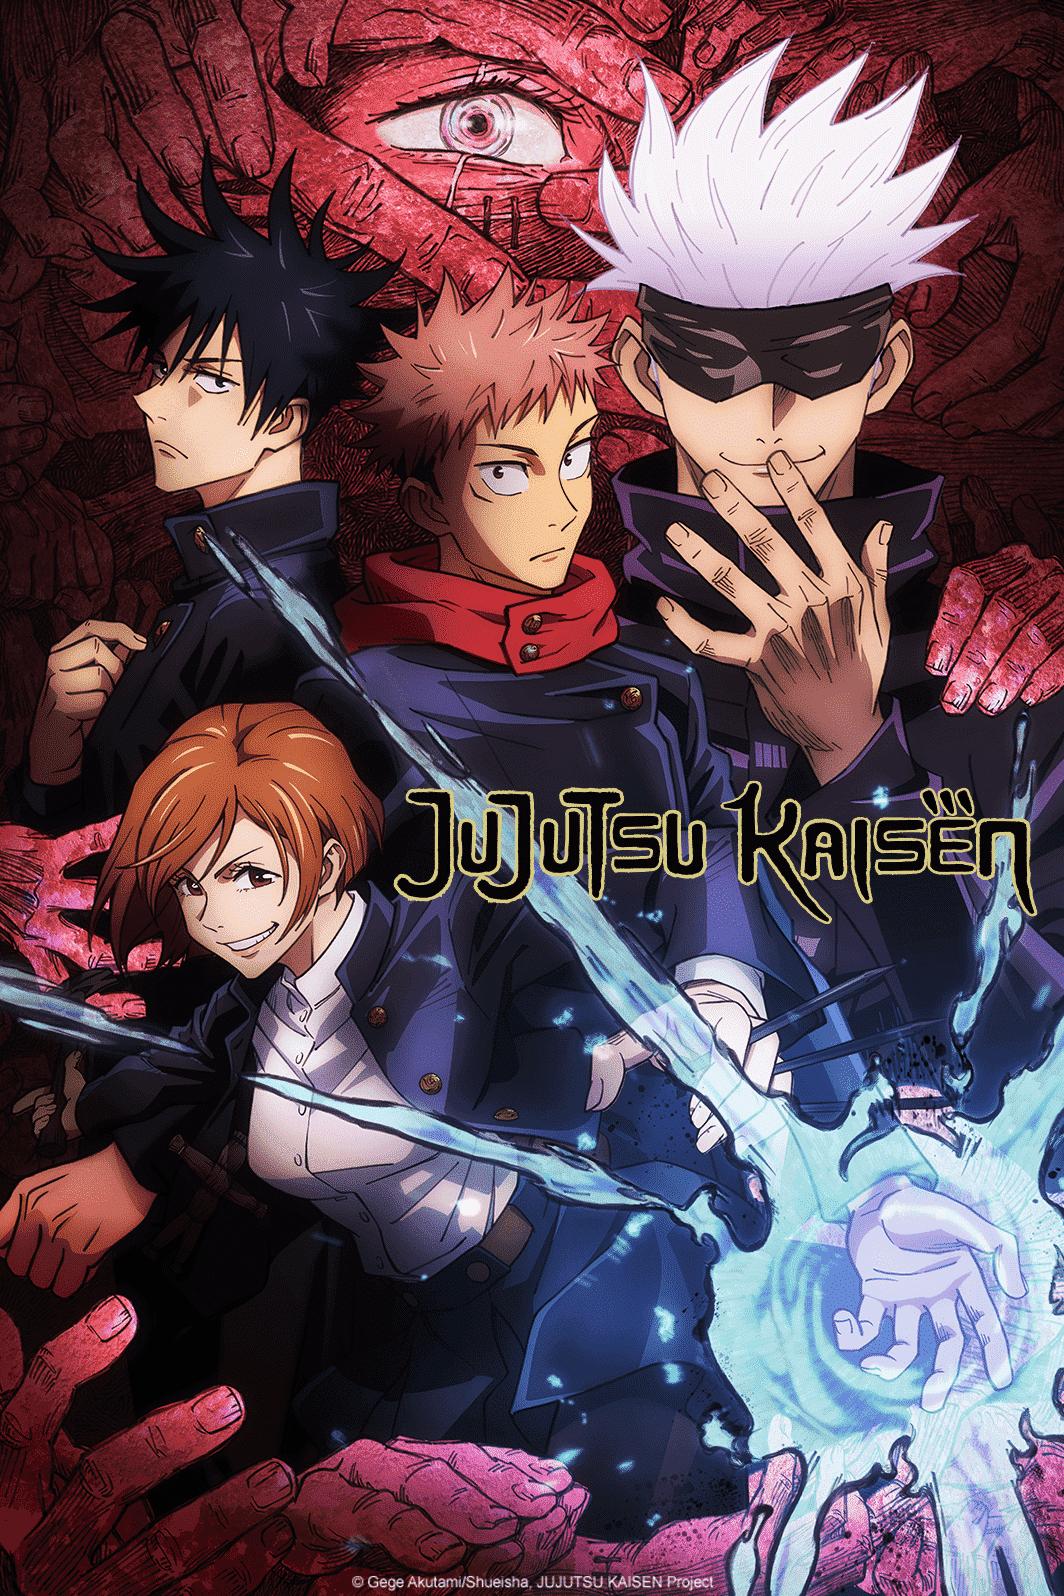 Jujutsu Kaisen (2020) มหาเวทย์ผนึกมาร ซับไทย EP1 – EP6